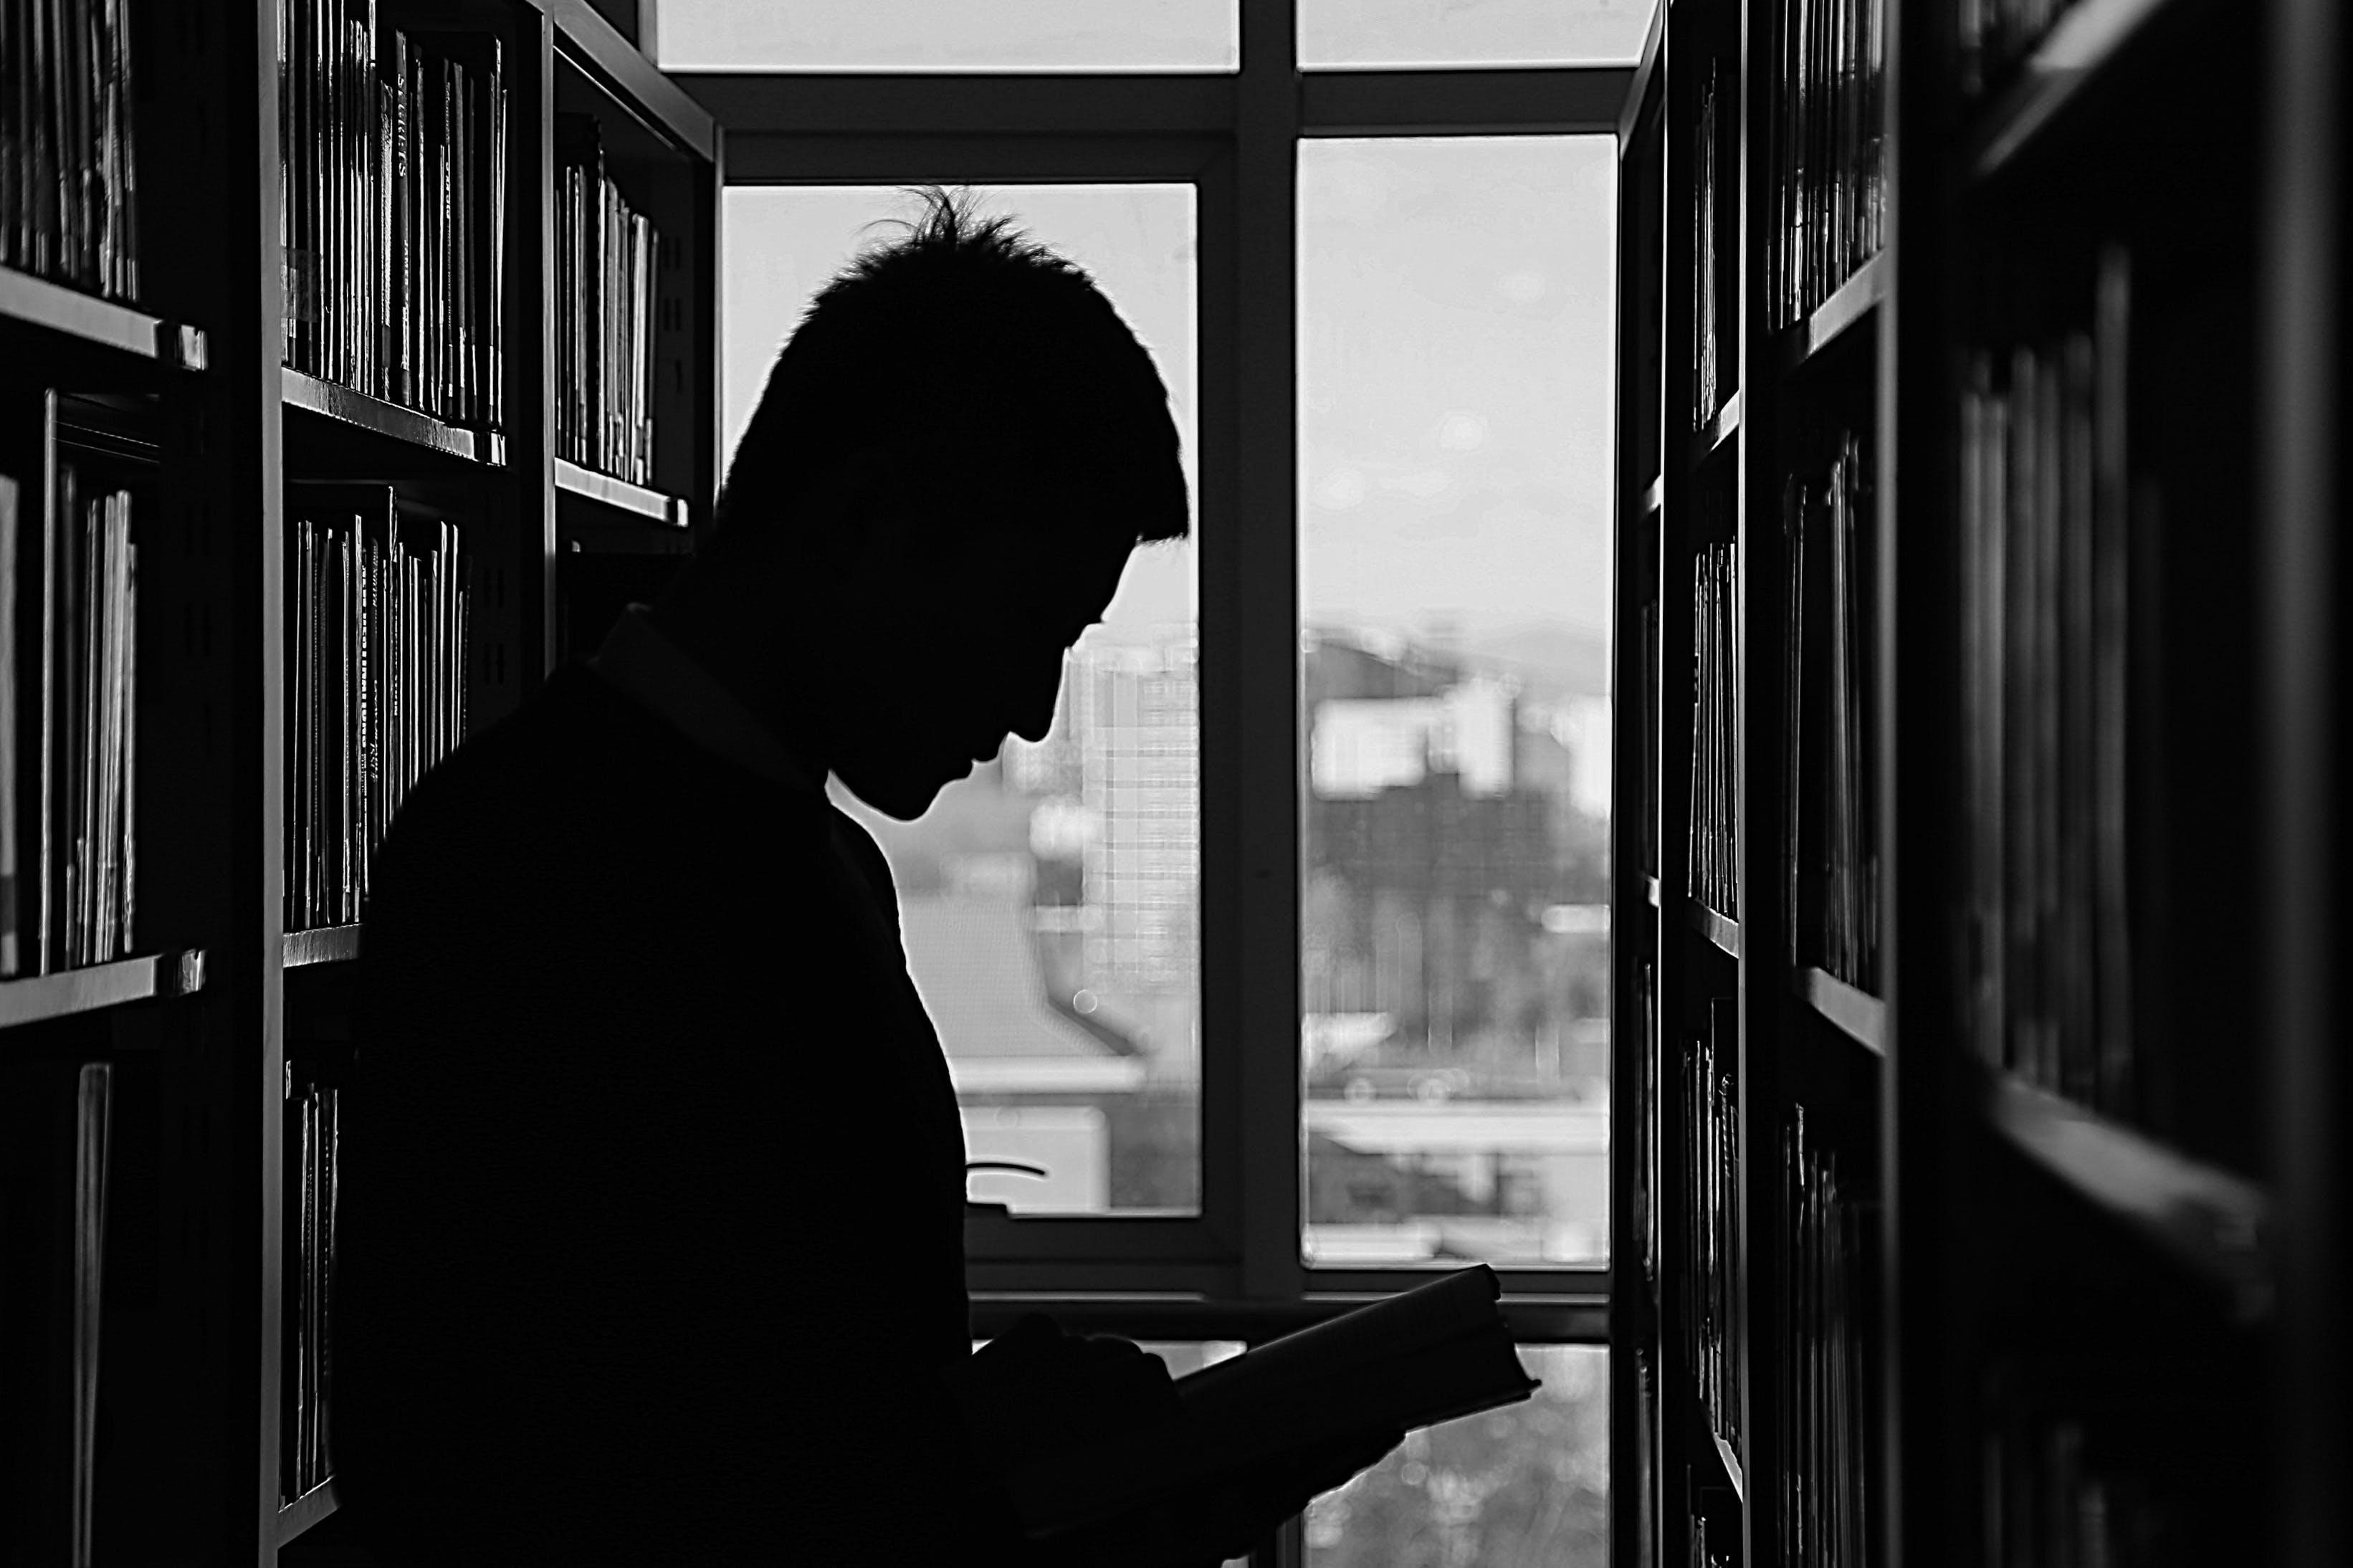 Foto profissional grátis de adulto, aluno, arquitetura, biblioteca